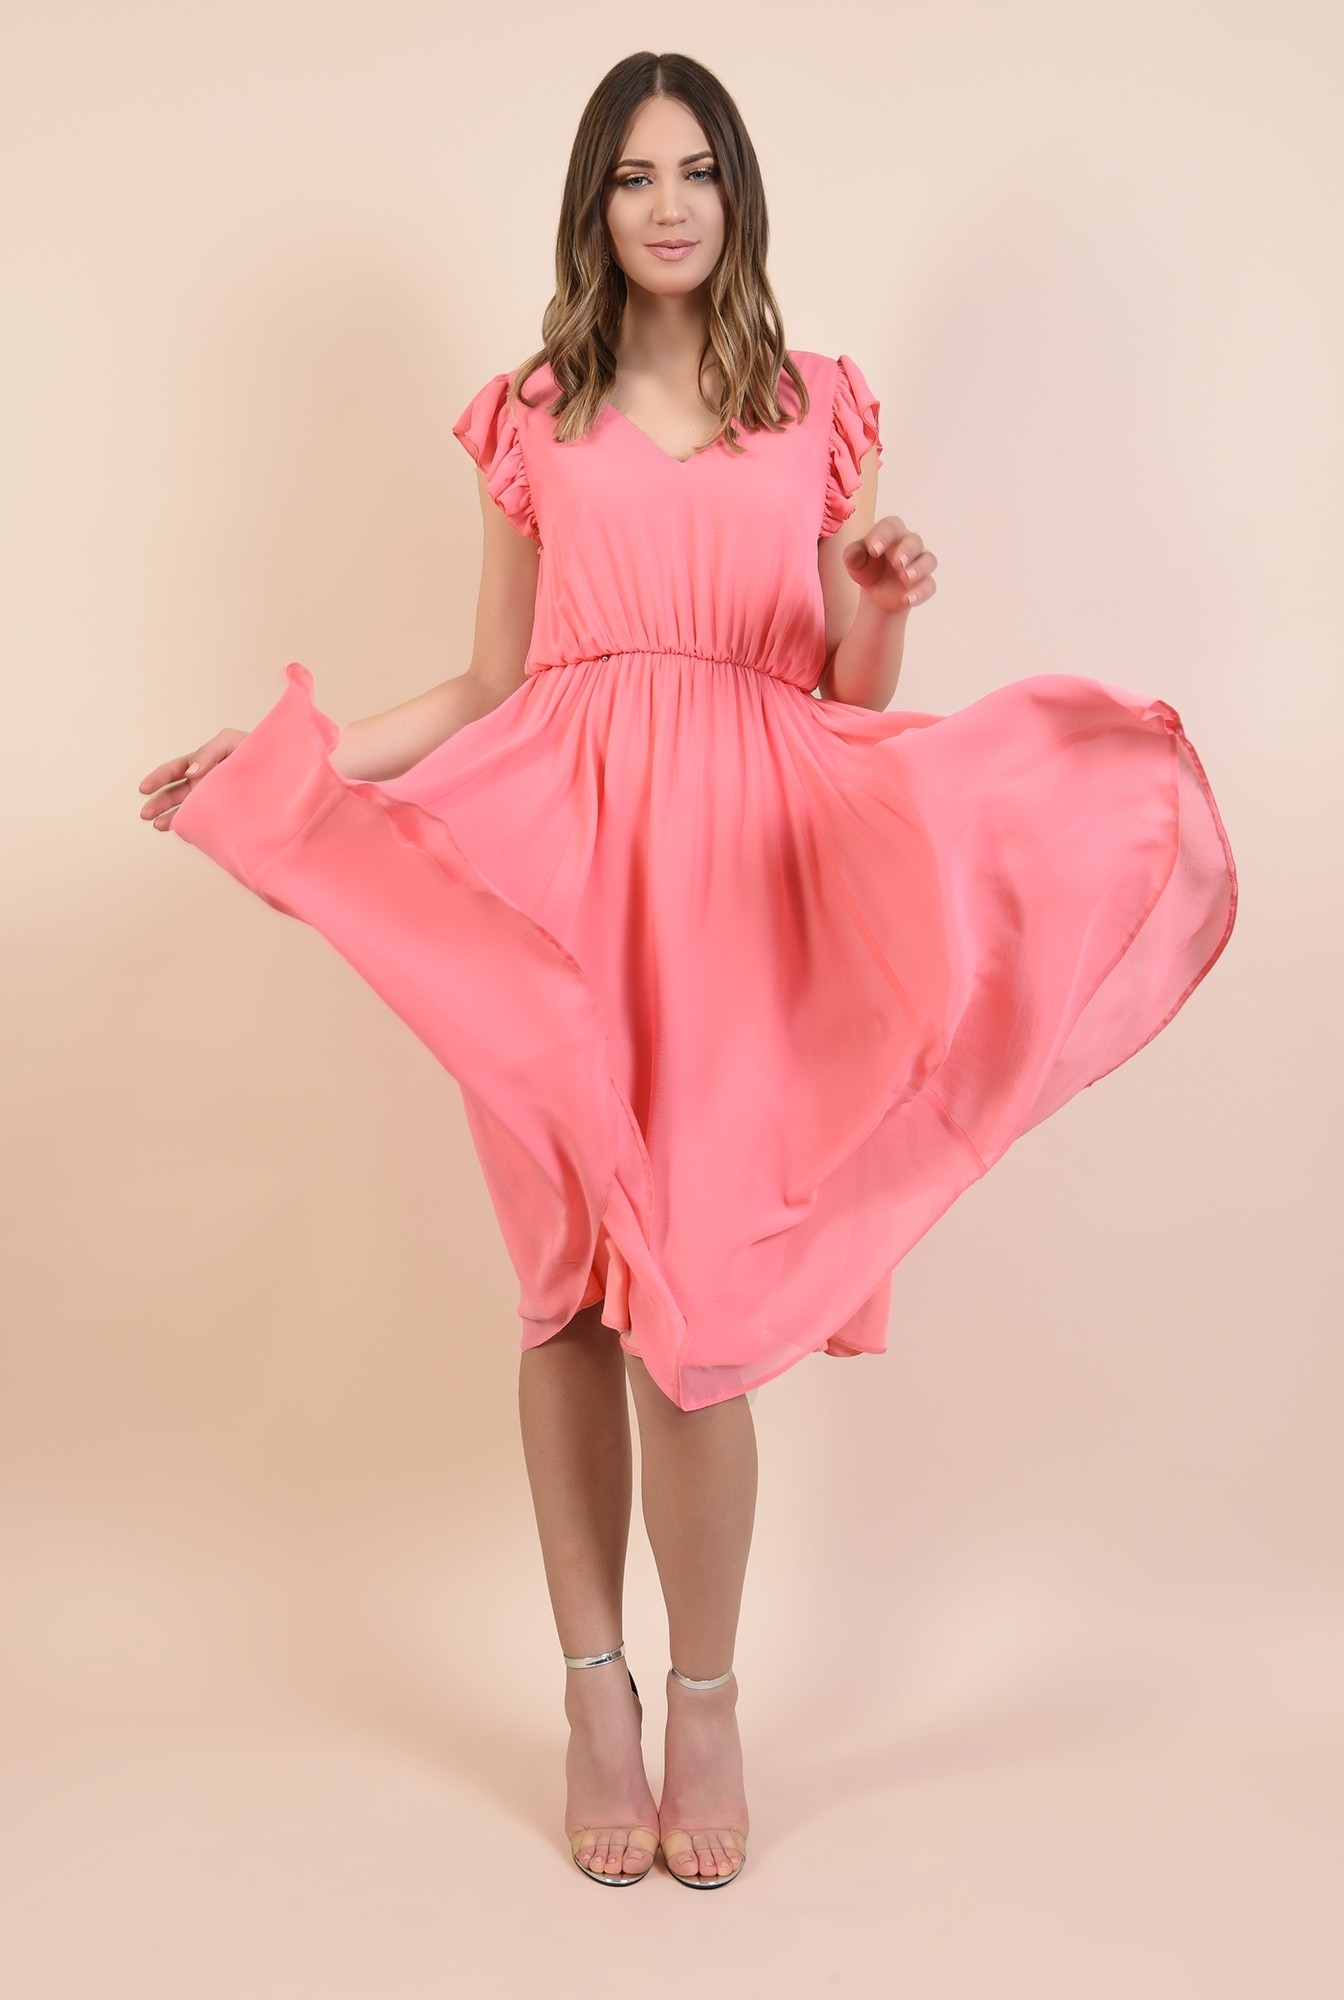 0 - rochie din voal, eleganta, roz, maneci volan, anchior, Poema